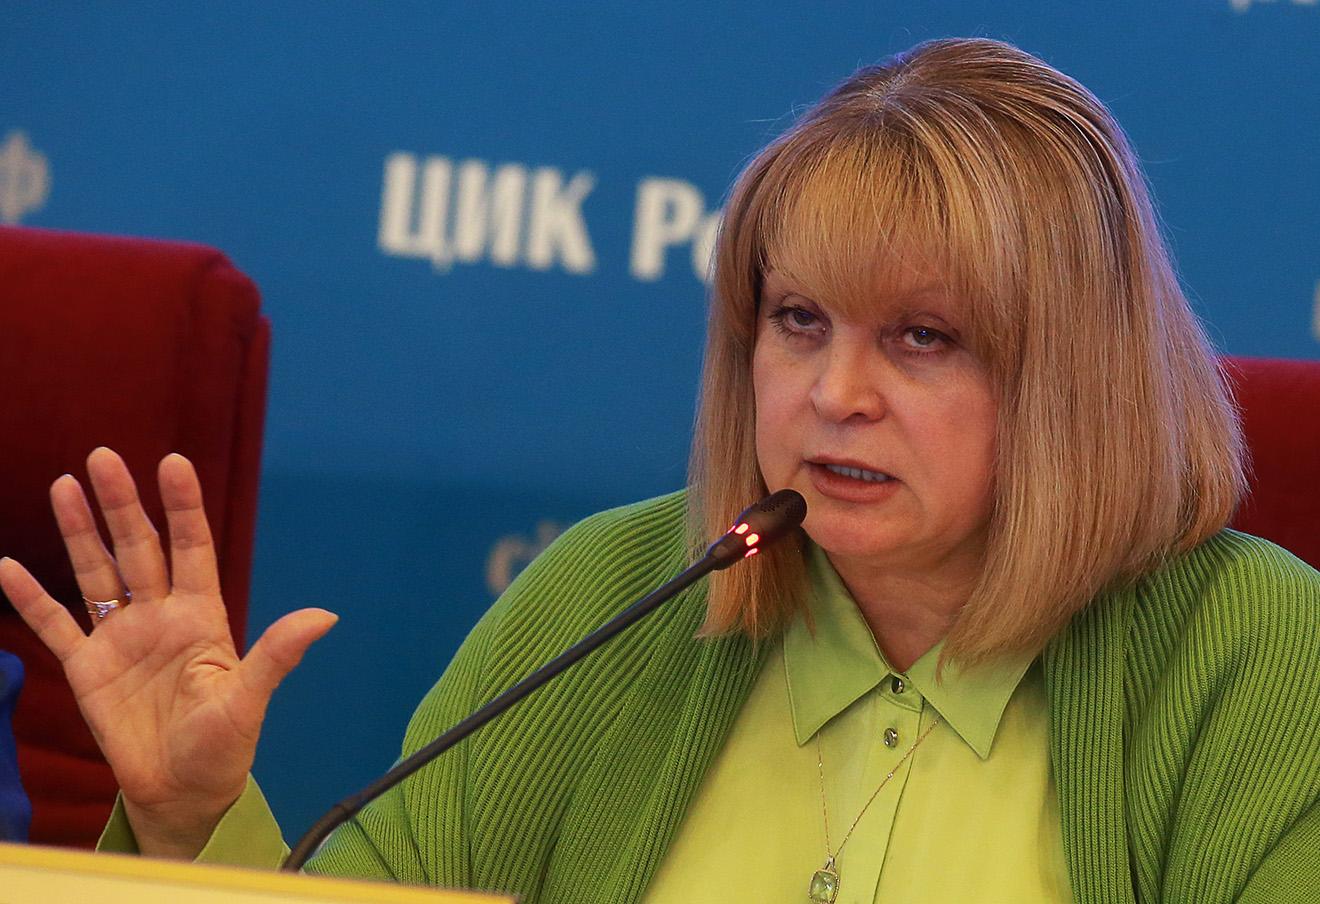 Председатель Центризбиркома РФ Элла Памфилова. Фото: Сергей Фадеичев / ТАСС